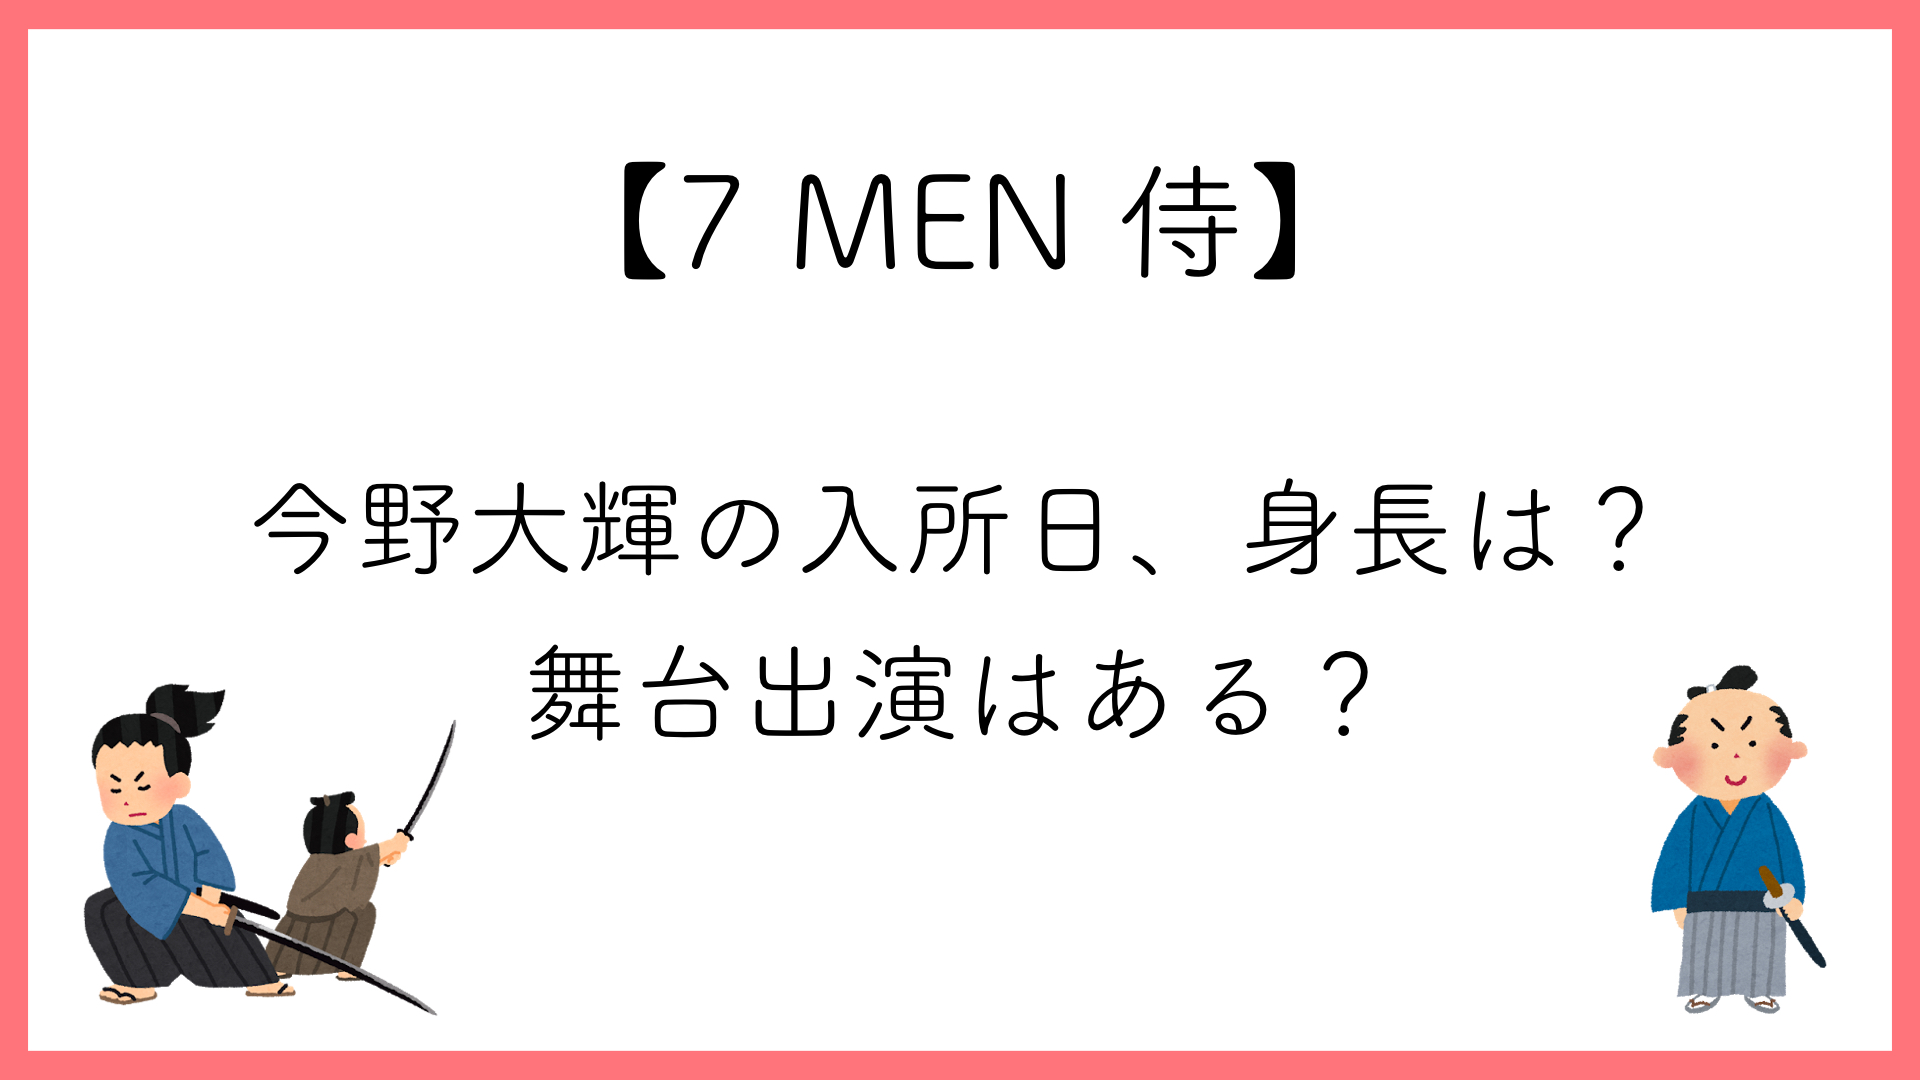 【7 MEN 侍】今野大輝の入所日、身長は?舞台出演はある?